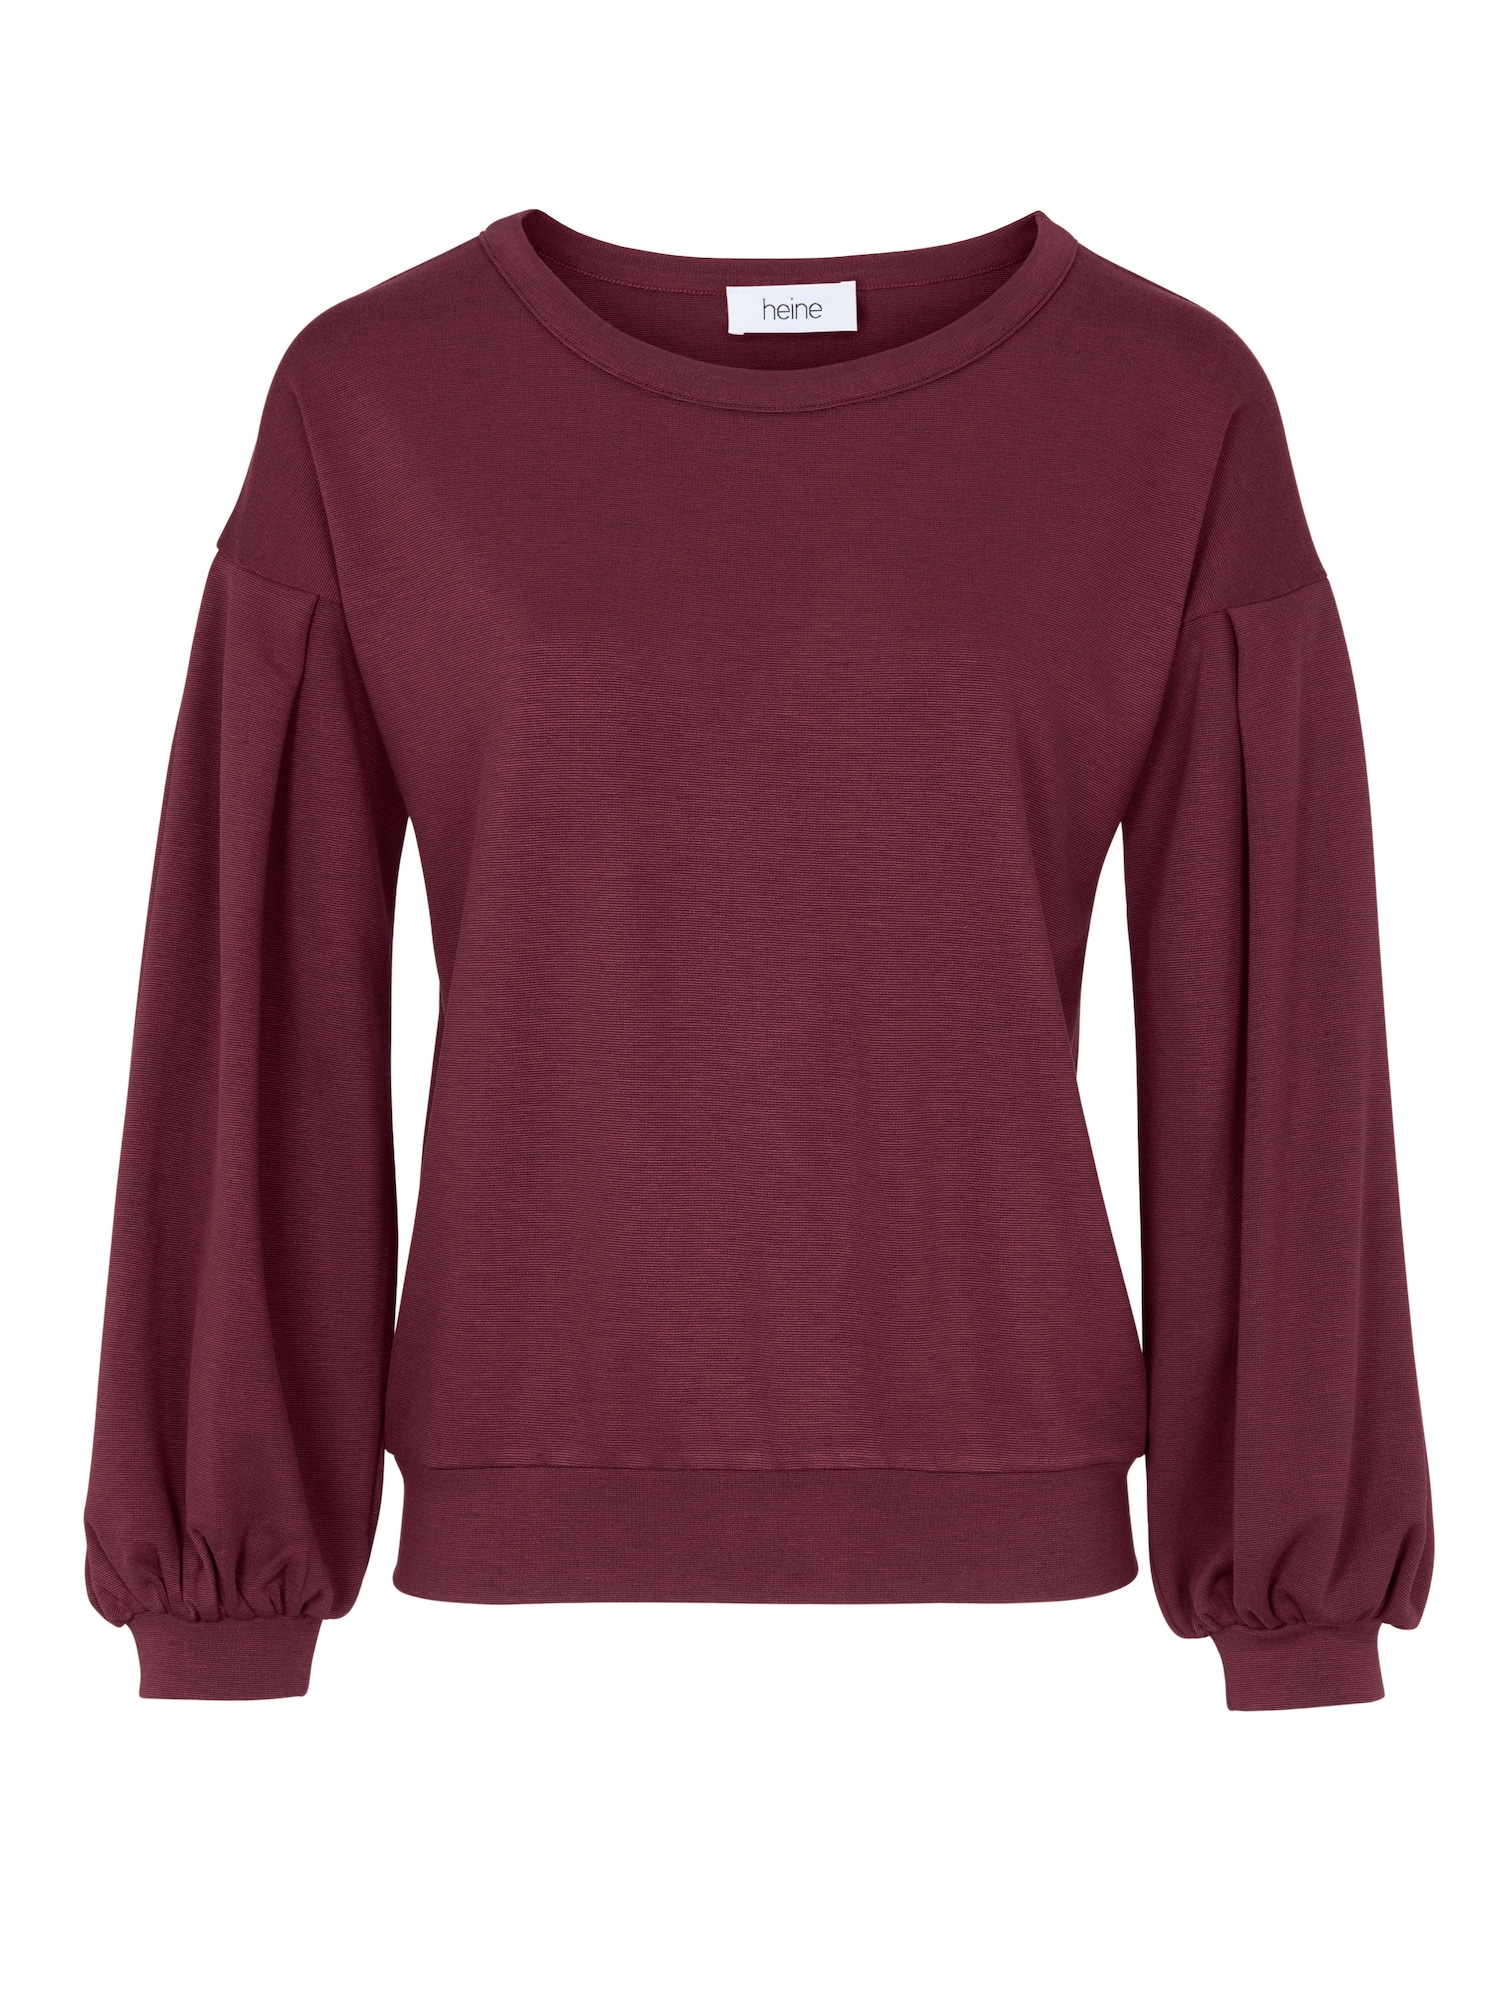 Heine, Dames Sweatshirt, bordeaux